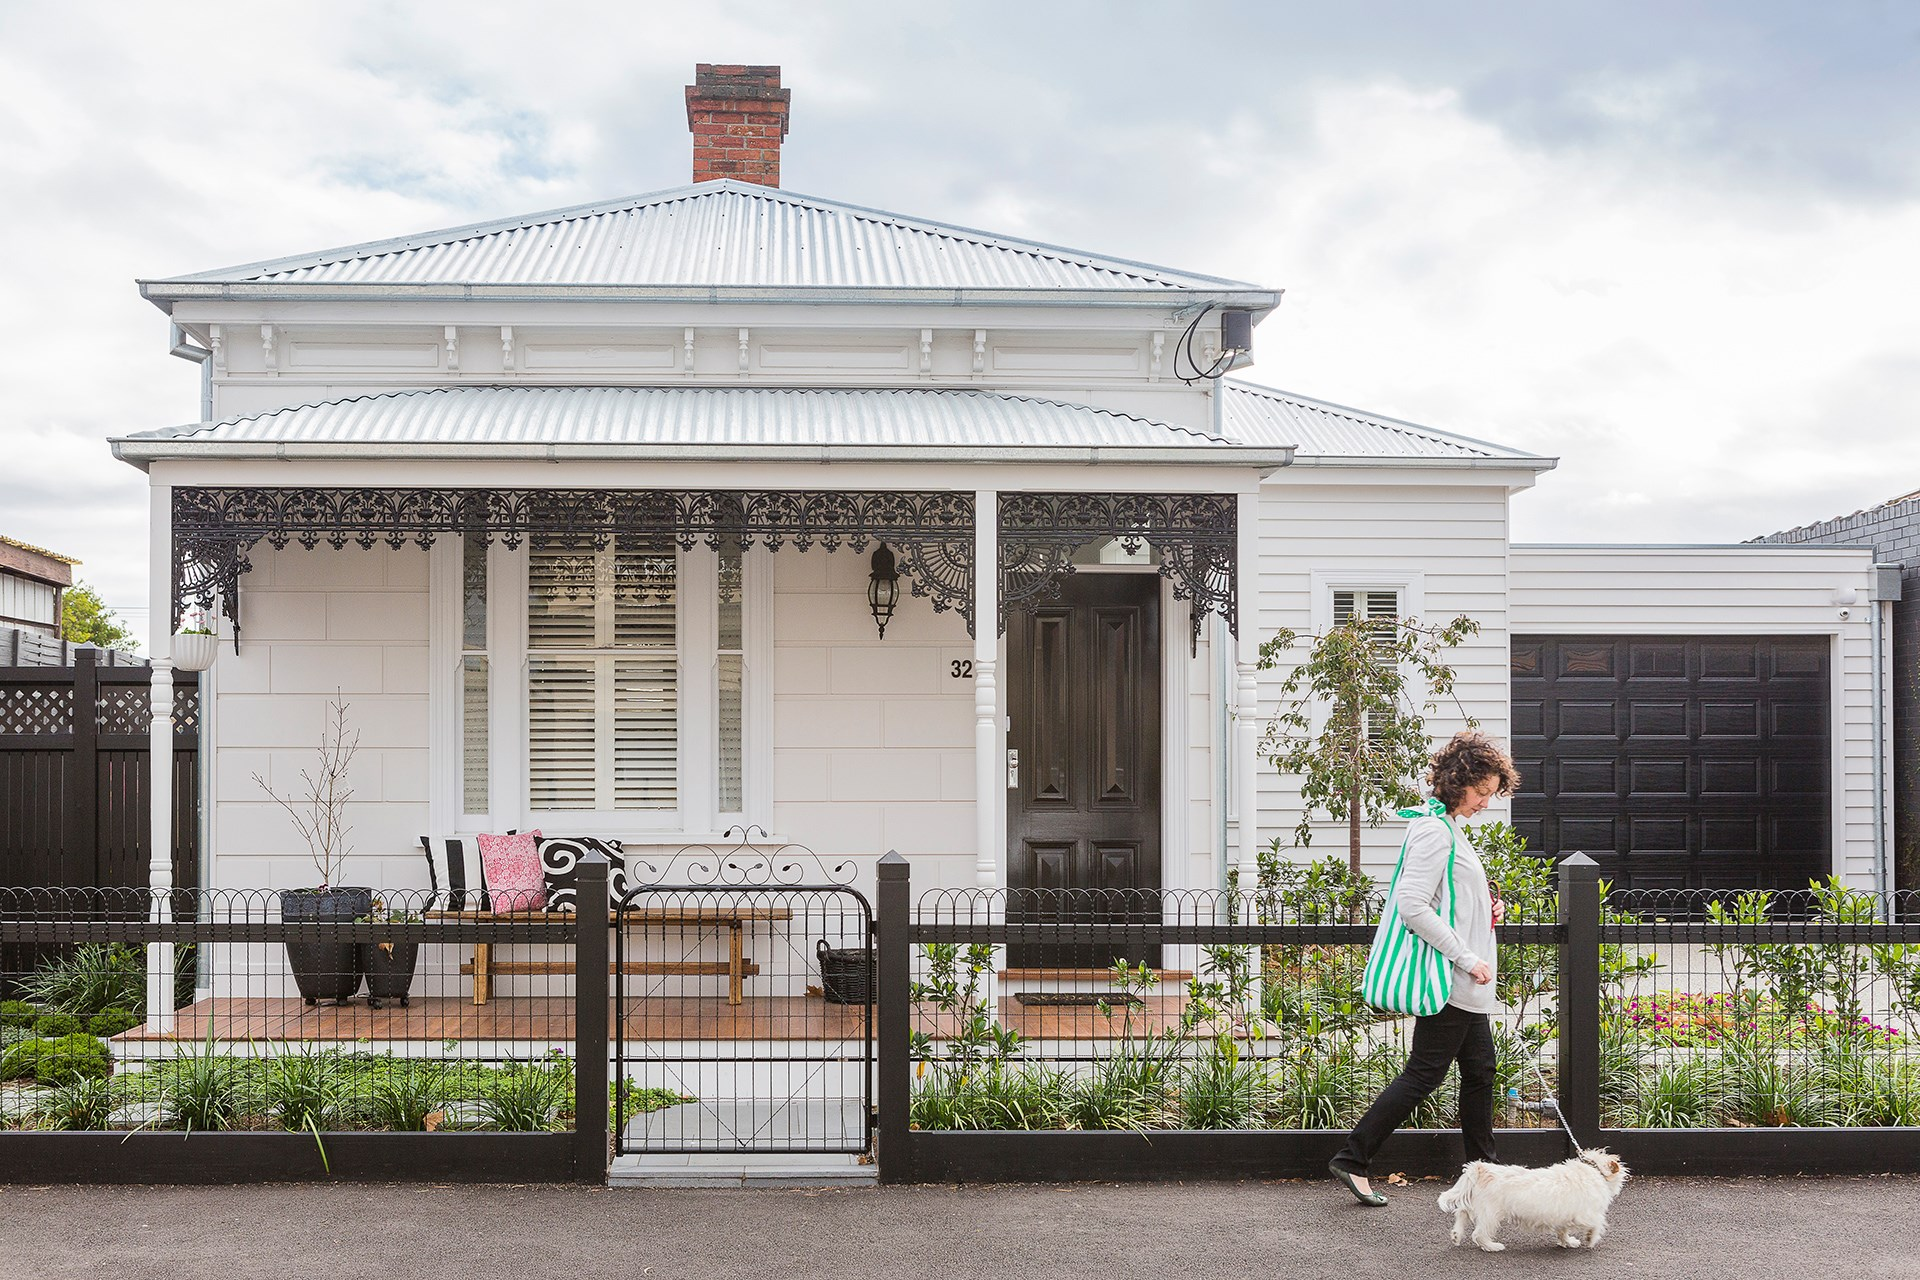 [Modern classic Victorian cottage renovation](http://www.homestolove.com.au/rachel-and-martys-modern-classic-renovation-1979). Photo: Maree Homer / *homes+*